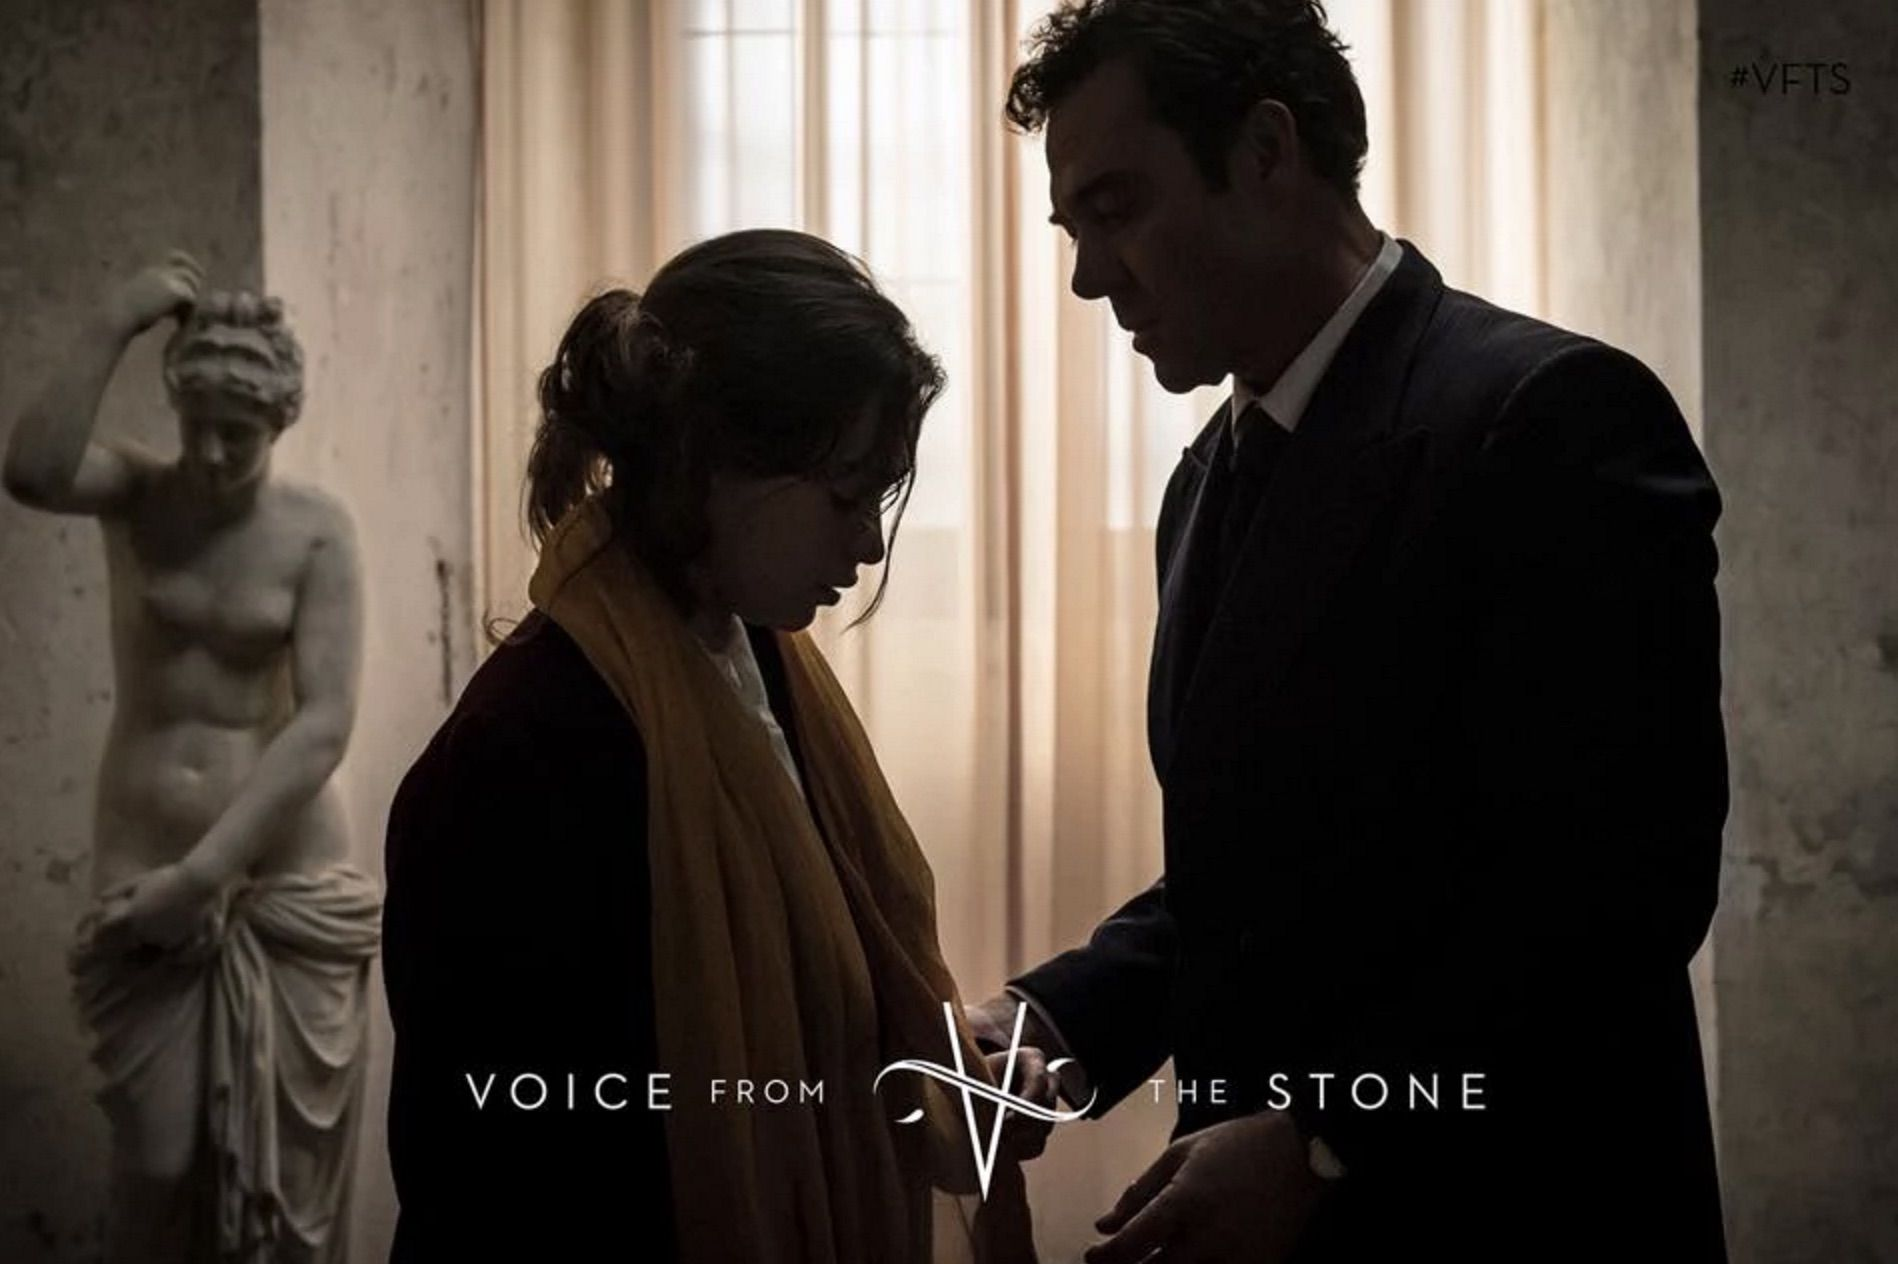 Imagen 4 de Voice From the Stone